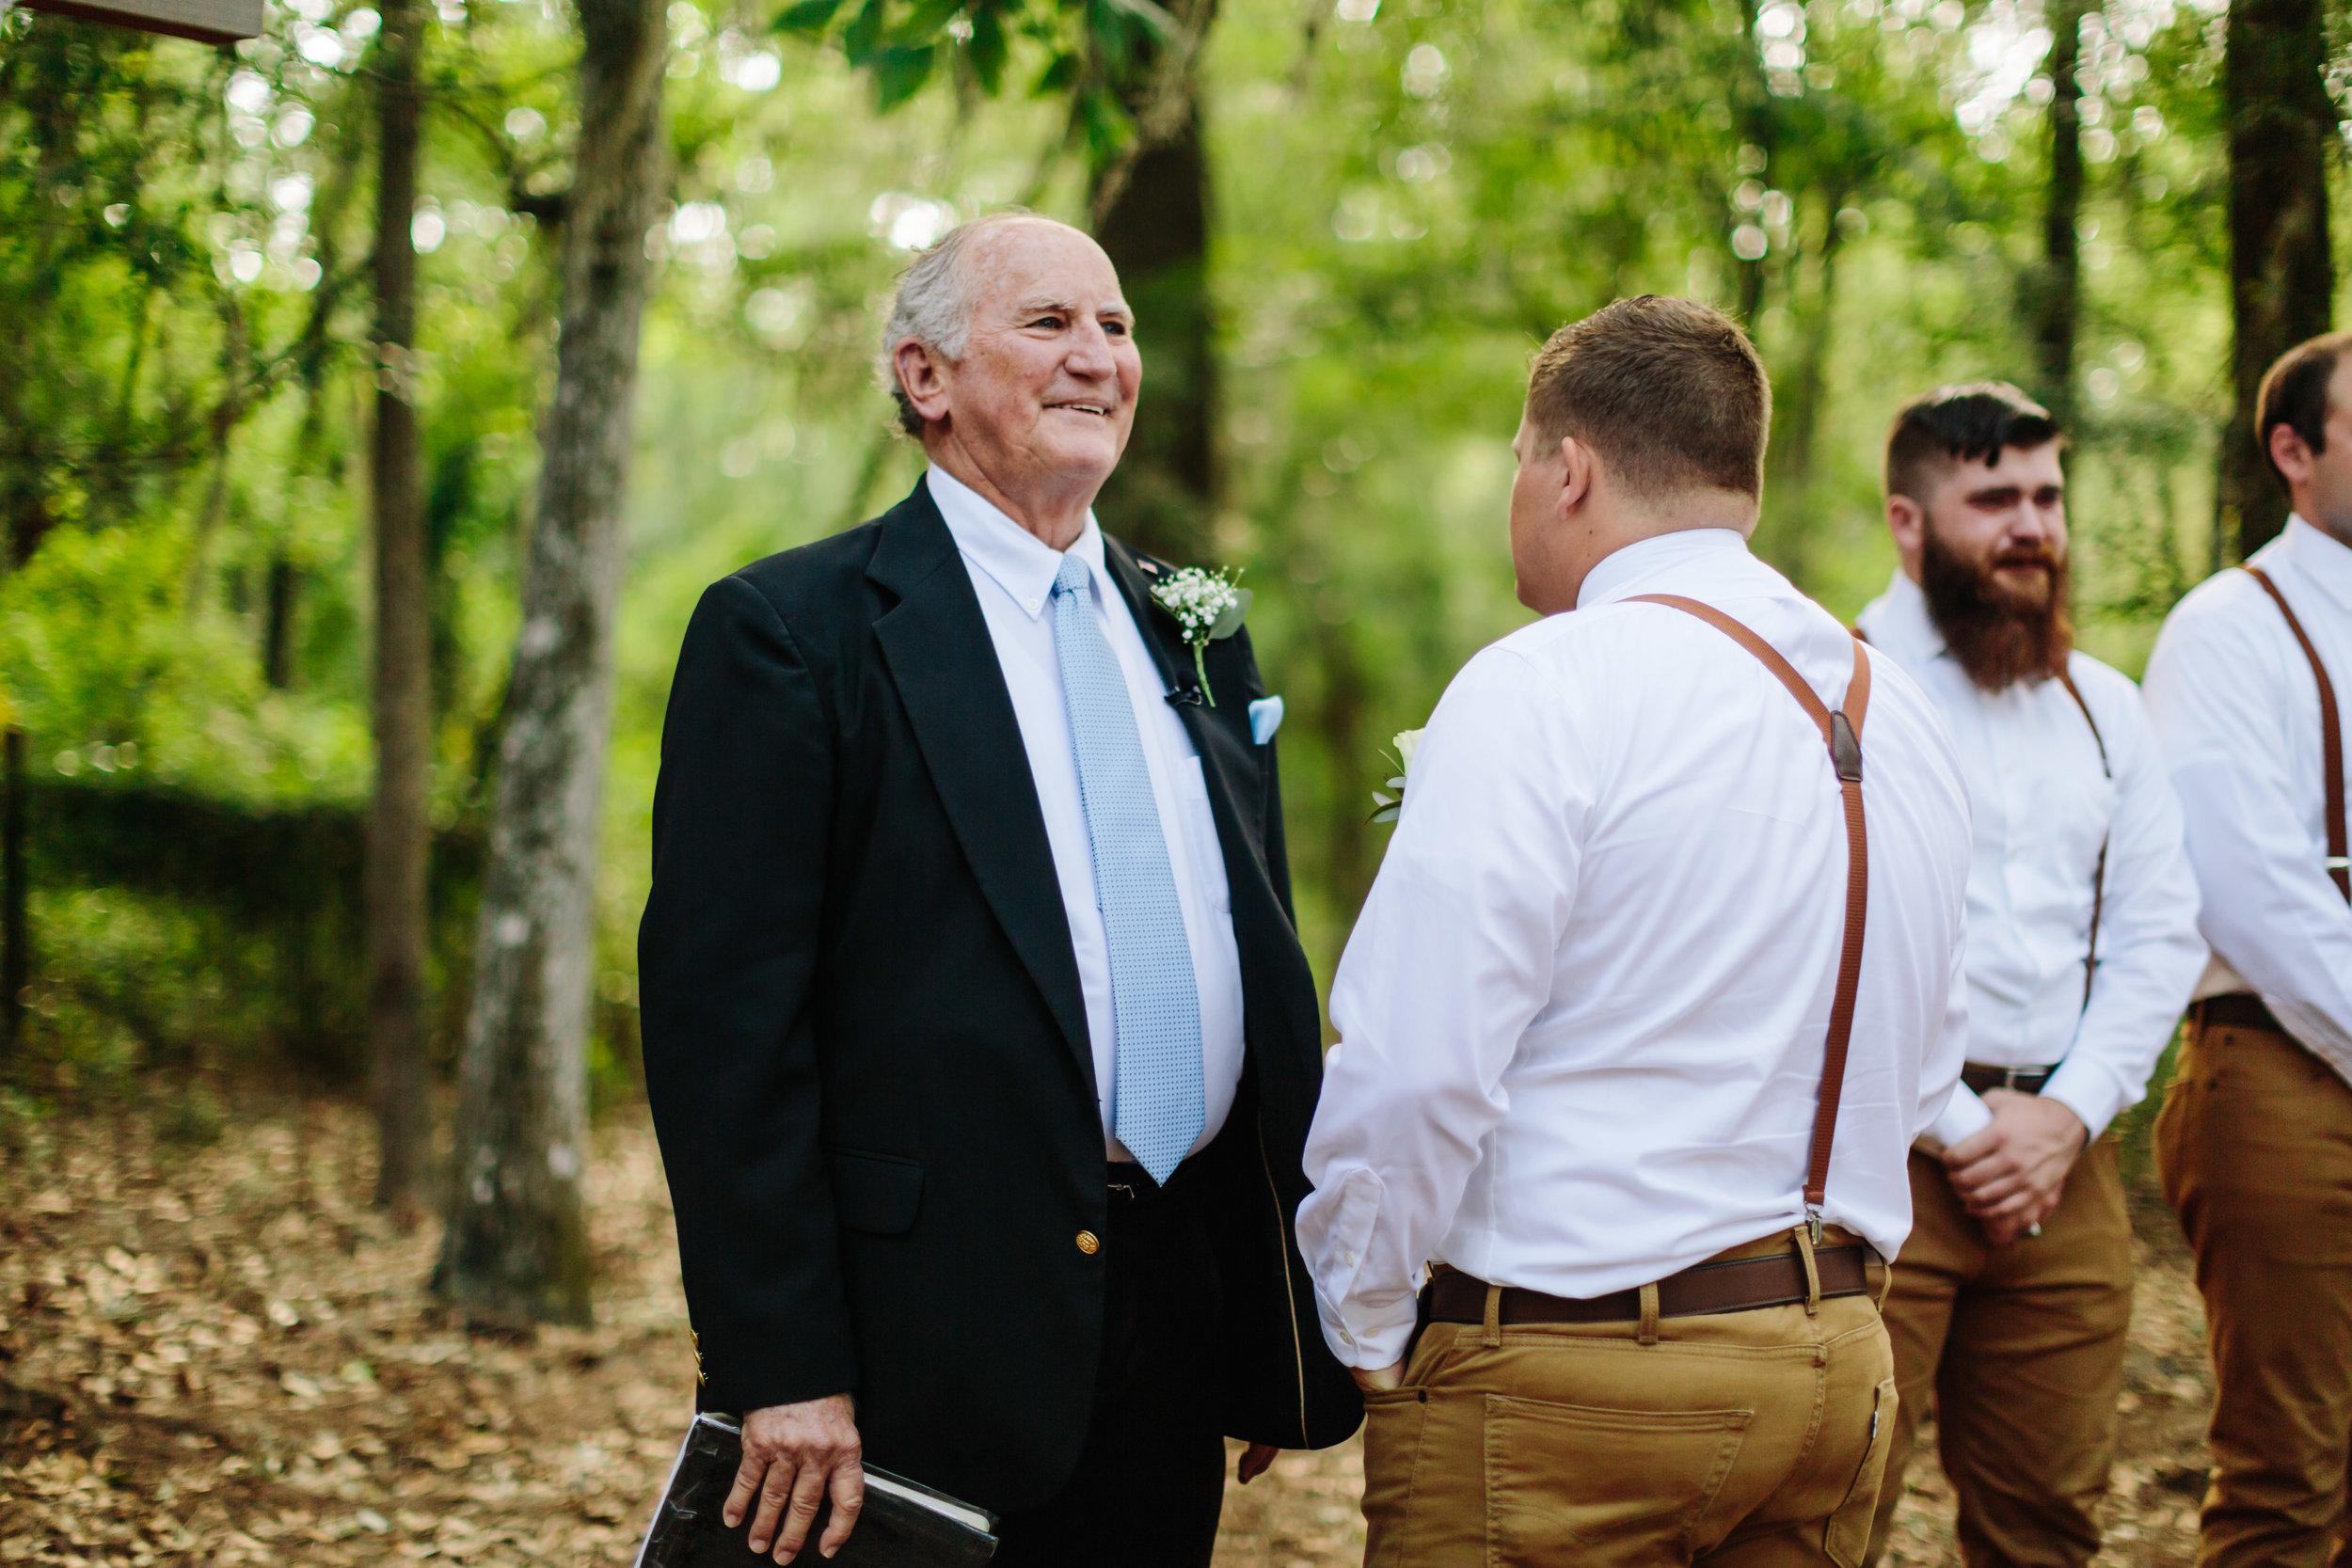 Griffin Wedding October Oaks Farm-301.jpg